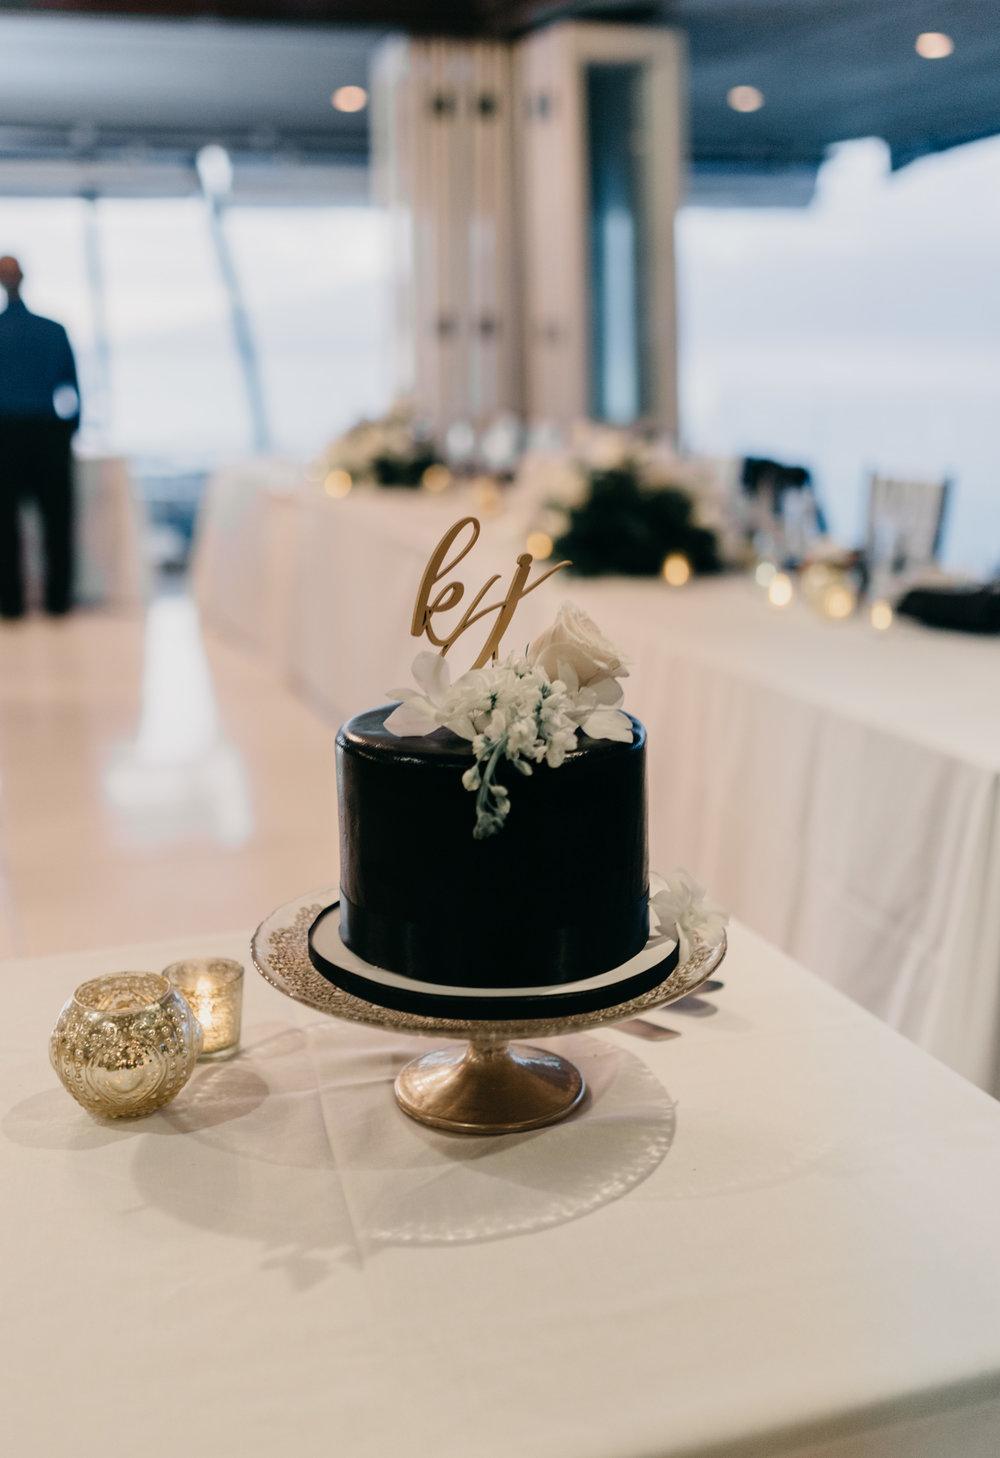 Black wedding cake | Merriman's Kapalua Maui wedding by Hawaii wedding photographer Desiree Leilani